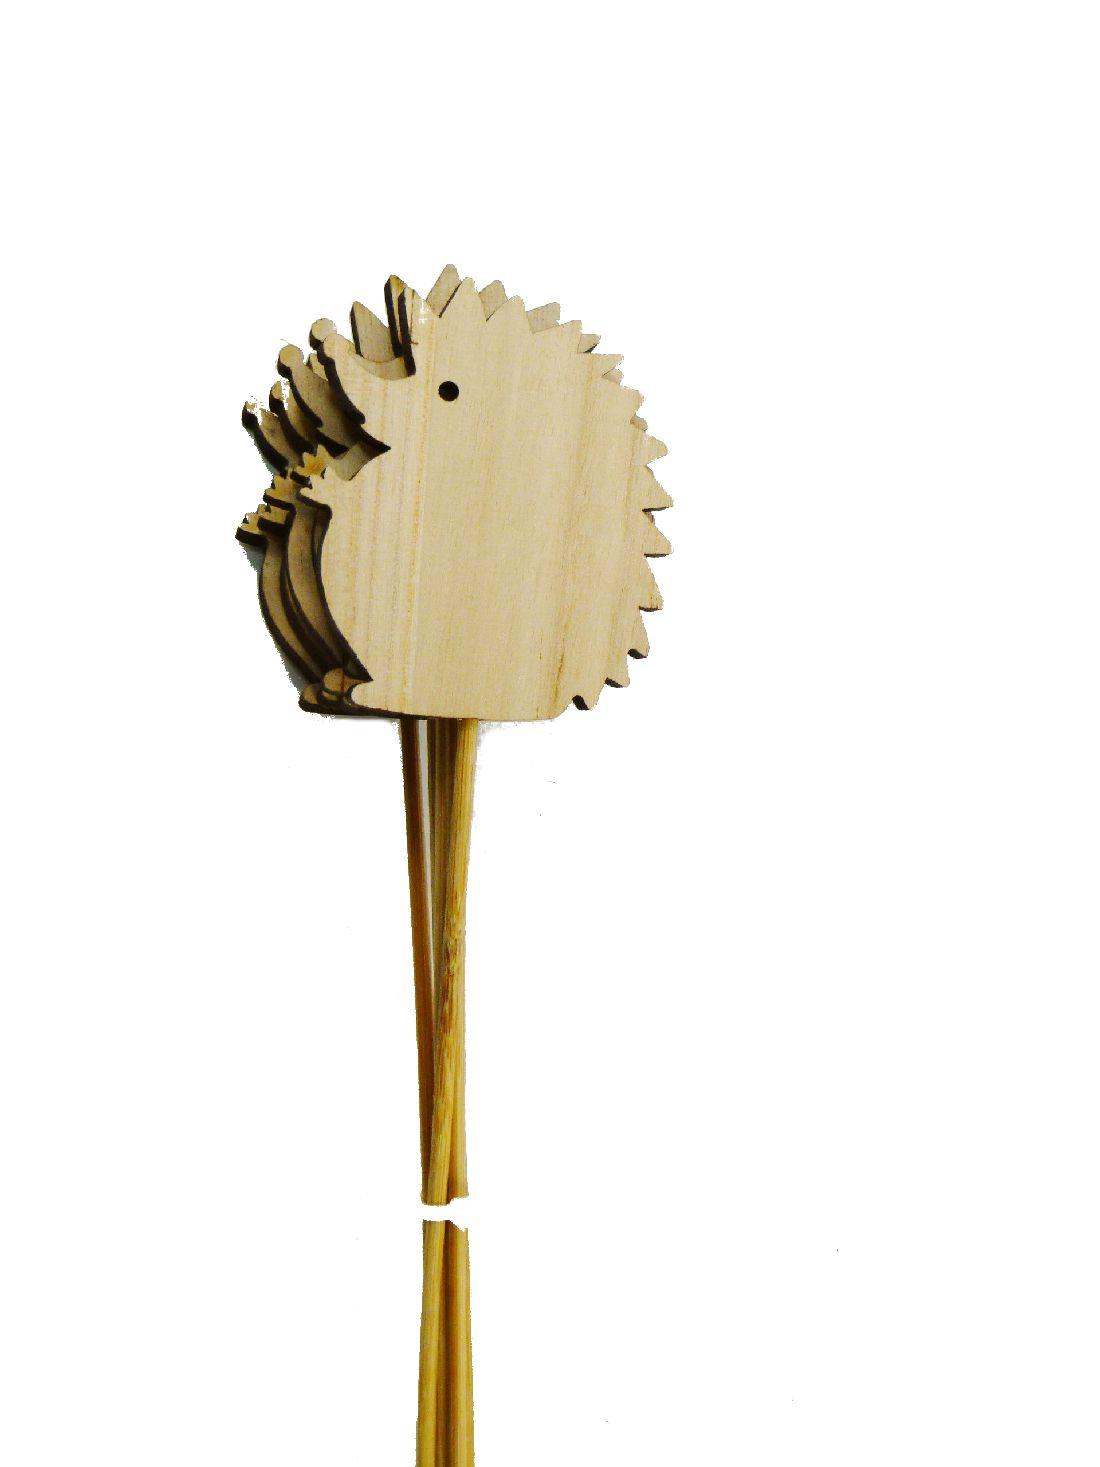 Holzstecker Waldtier NATUR 15026 Holz Igel 8cm Gesamtlänge: 38 cm